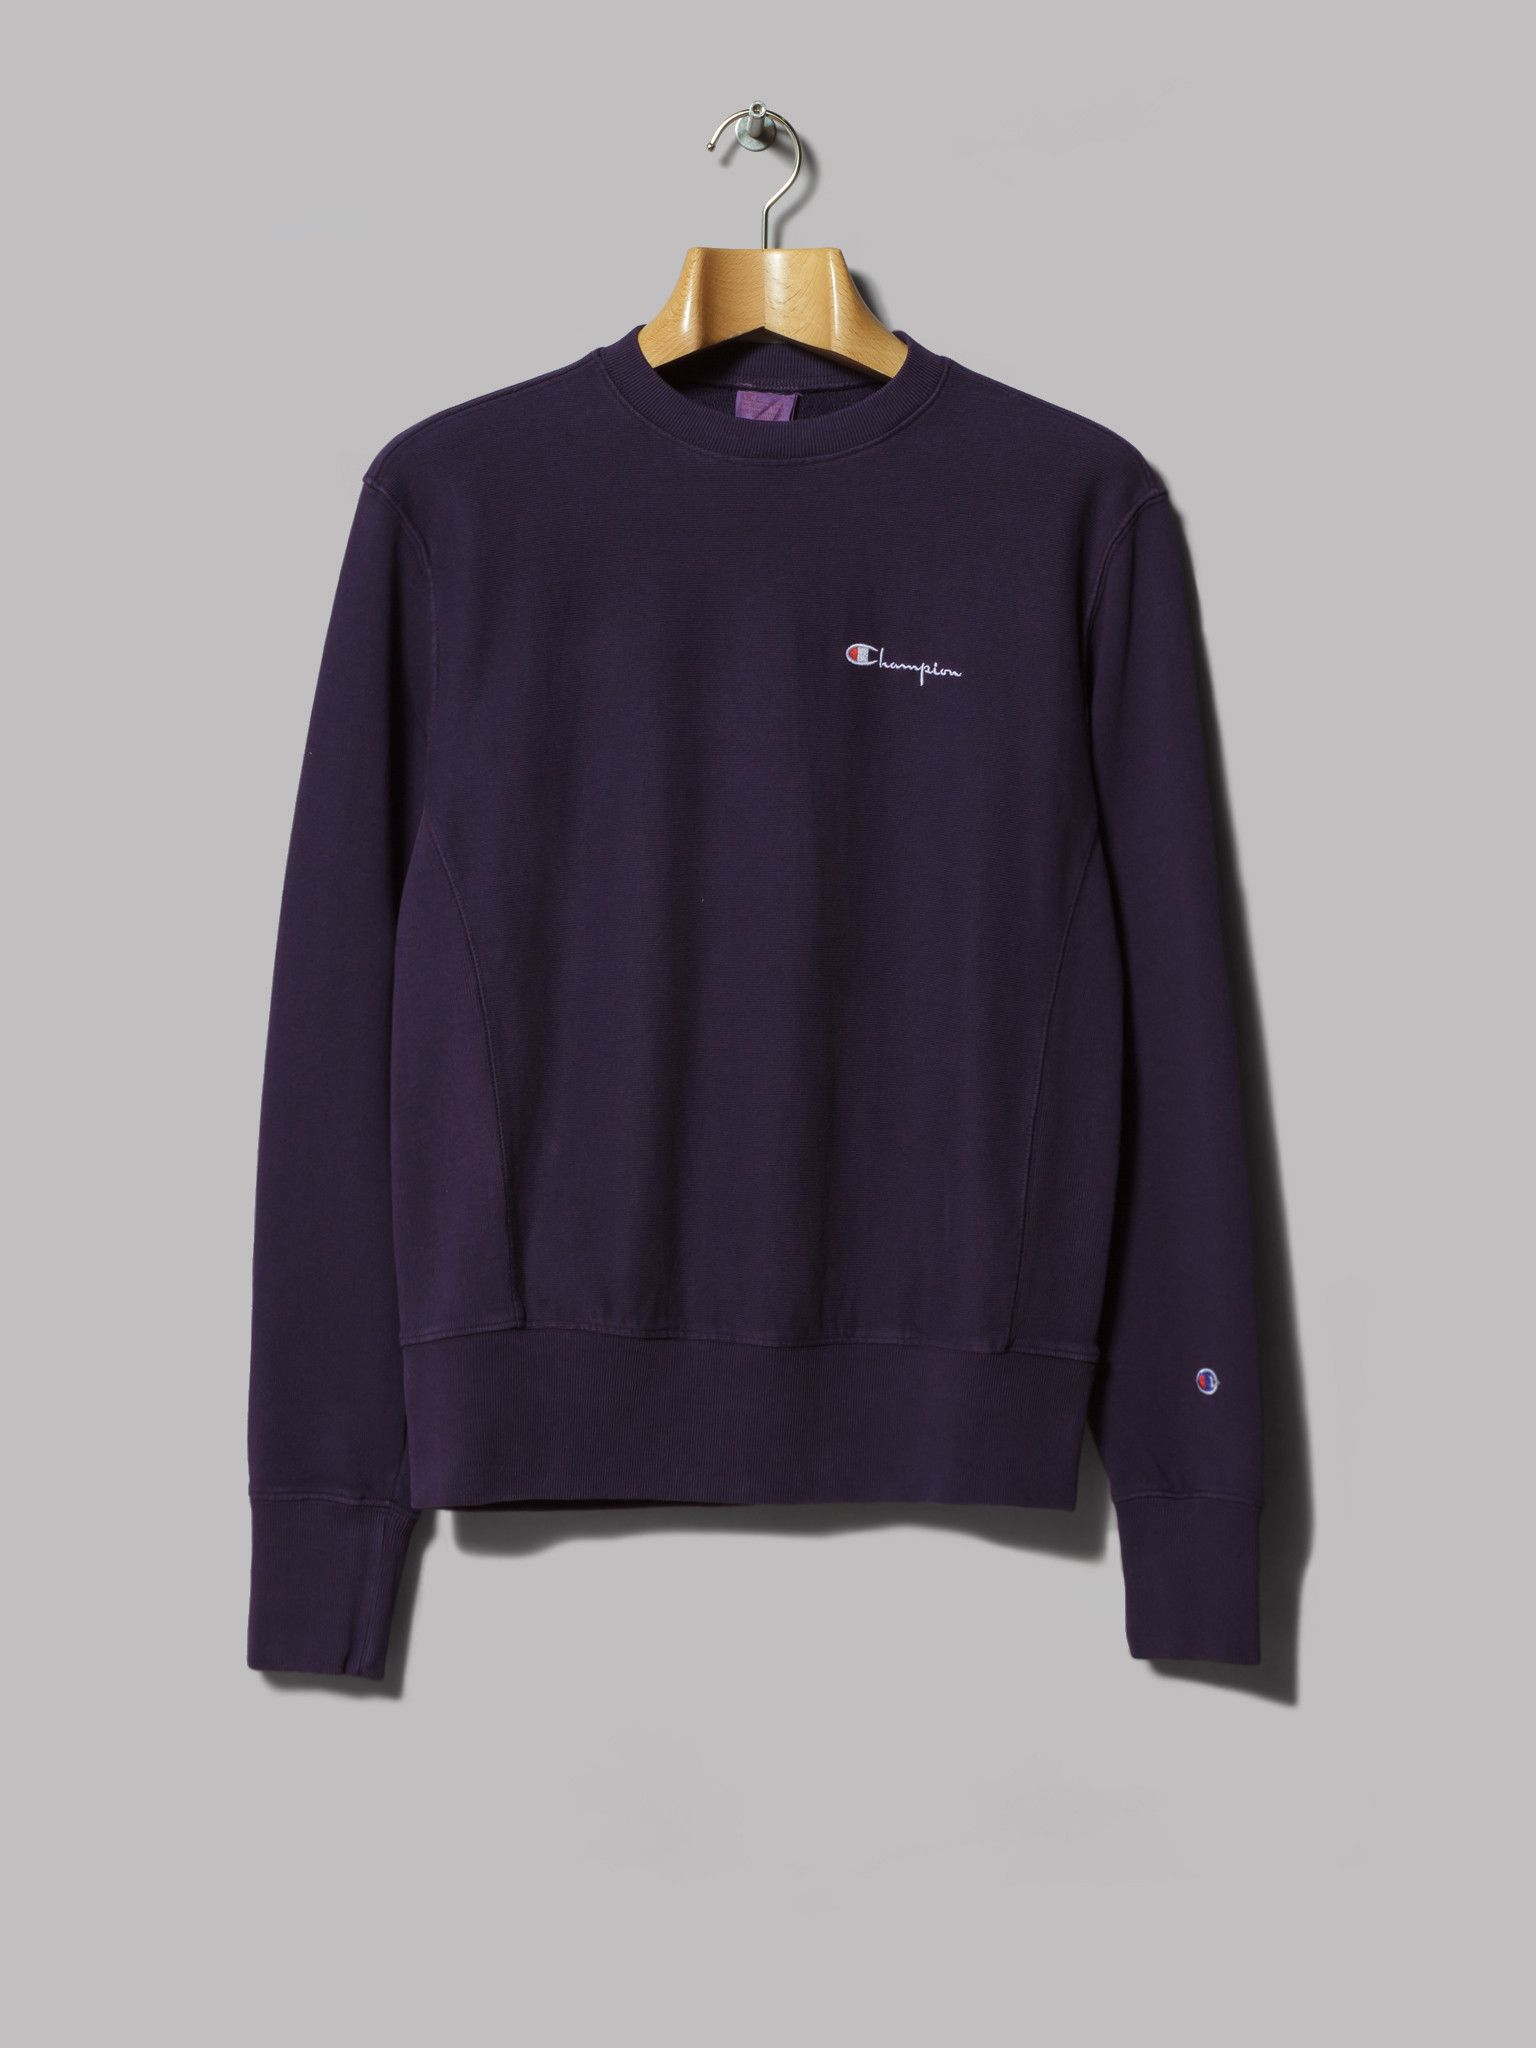 Champion Reverse Weave Crewneck Sweatshirt (Dark Purple)